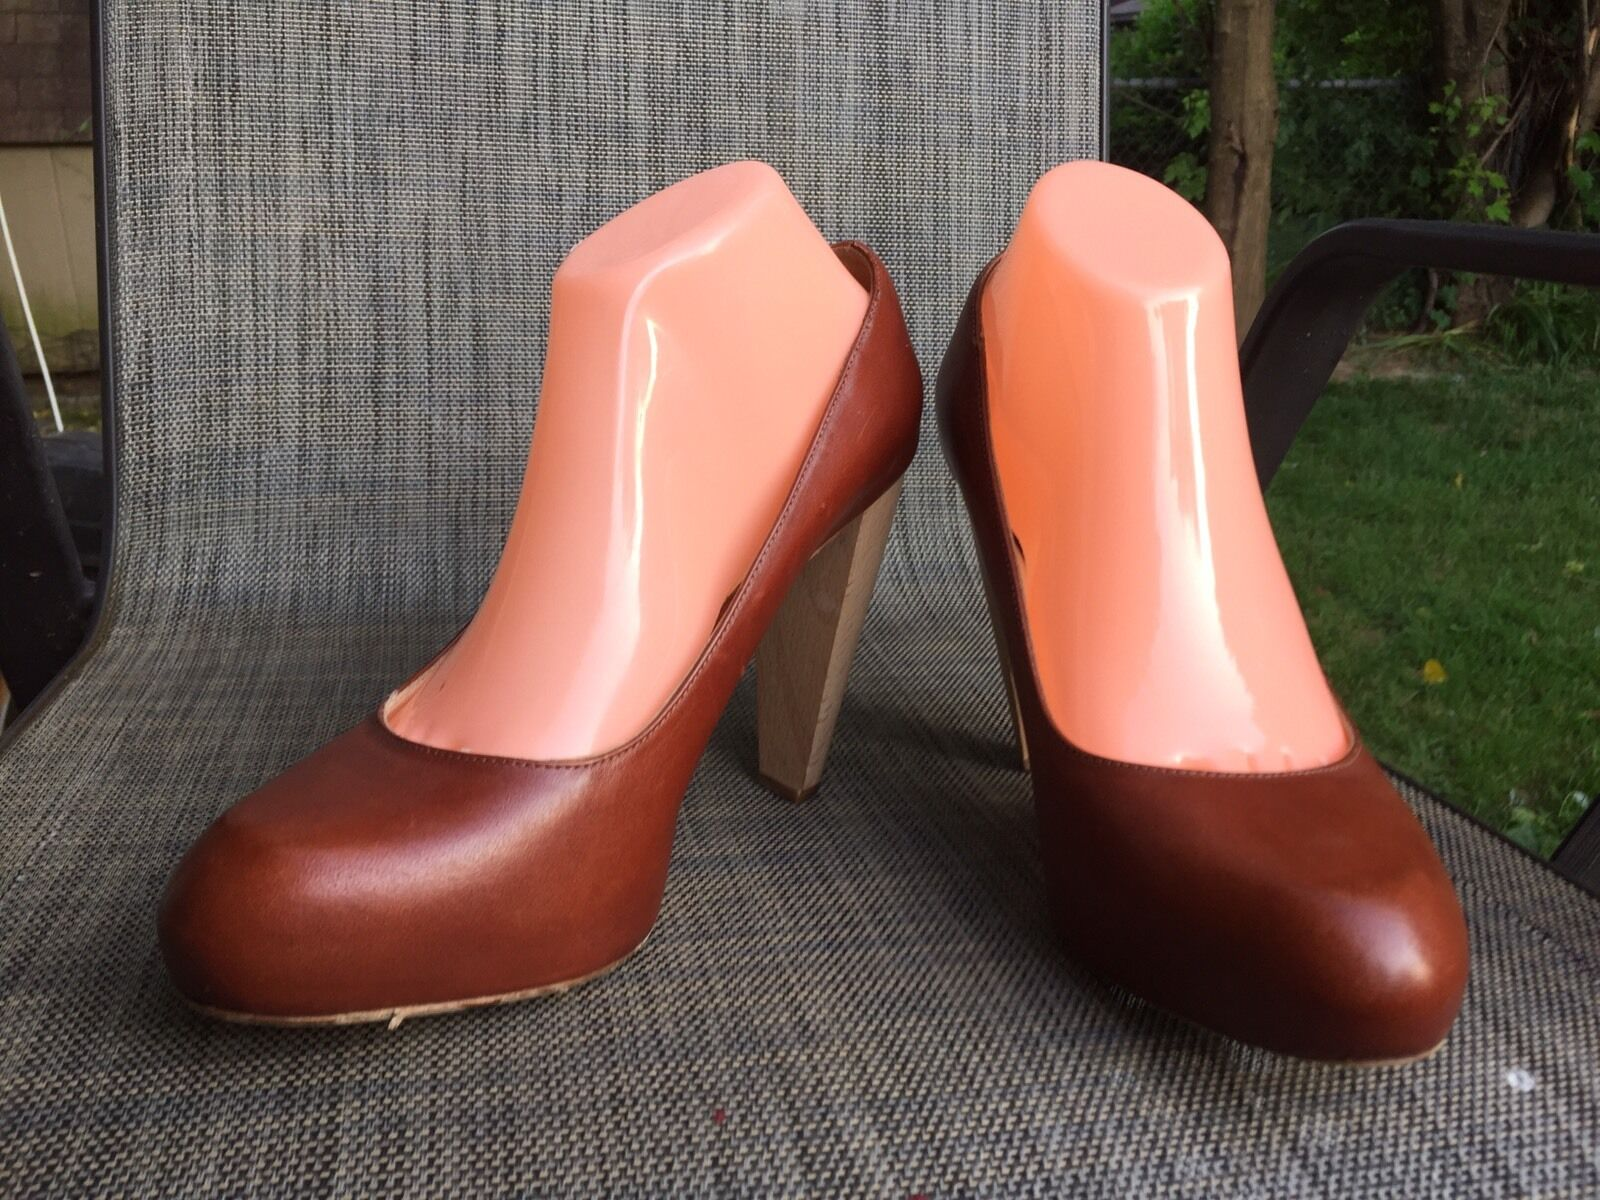 Loeffler Randall Madera Cuero Marrón Plataforma De  Tacón Alto zapatos  De De Salón talla.10B 544c22